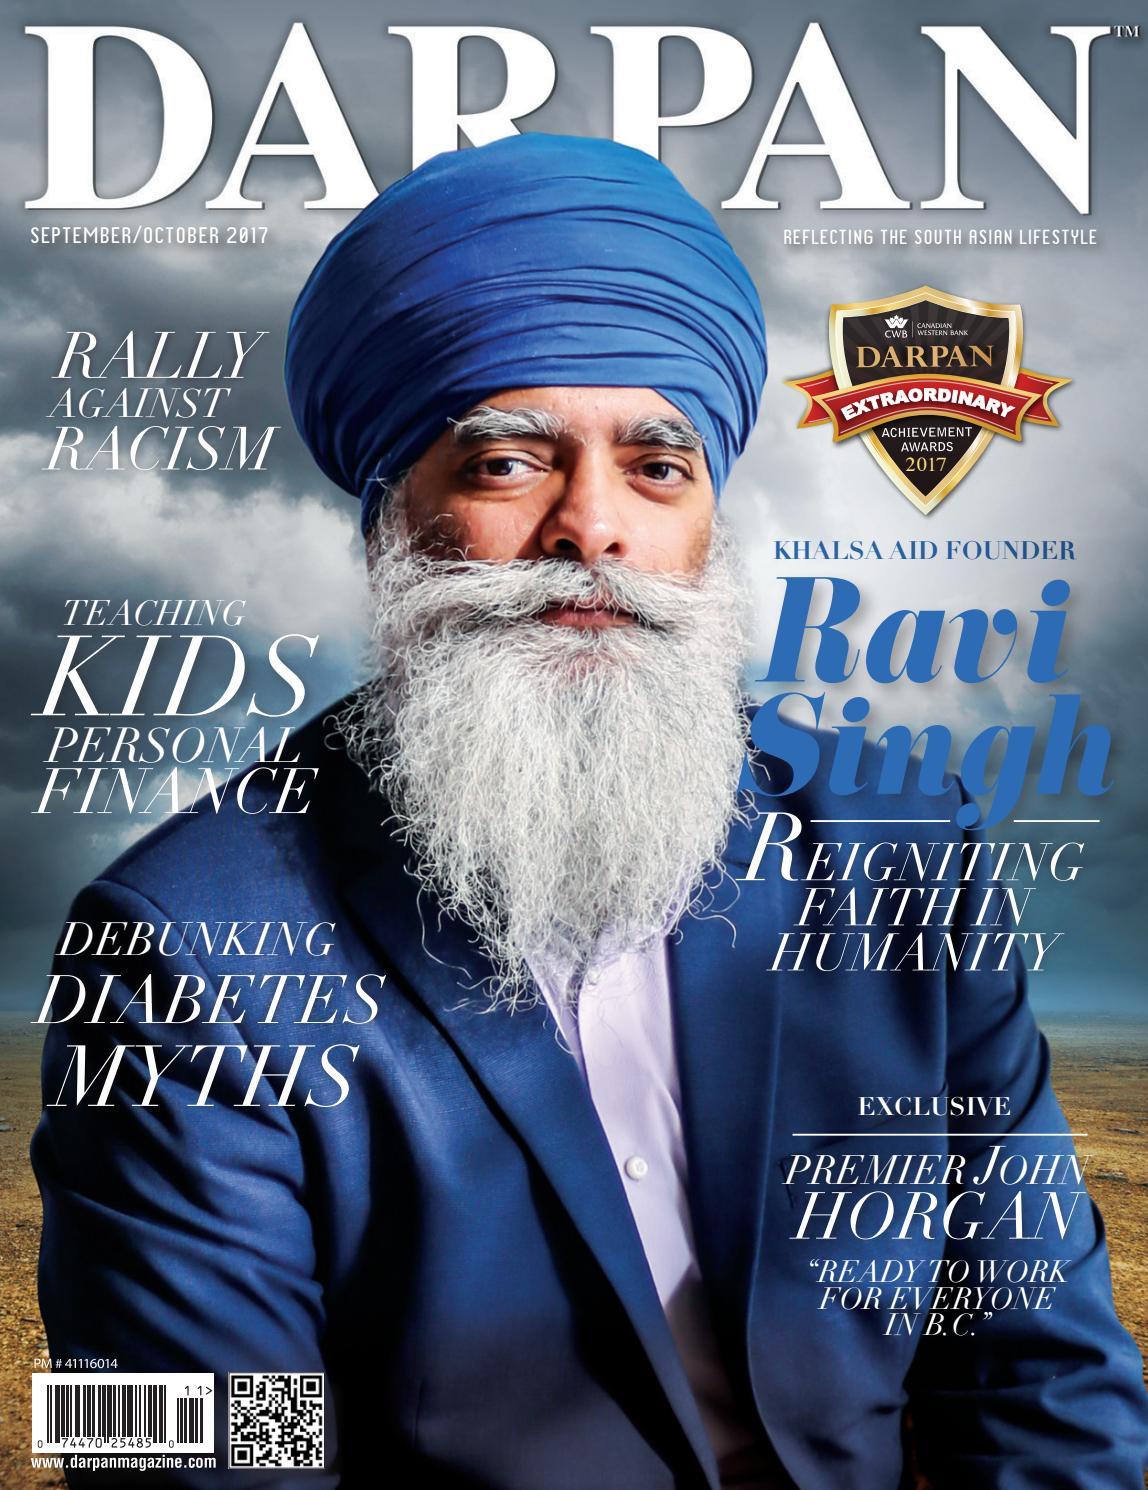 Darpan sept oct 2017 by Darpan Magazine - issuu